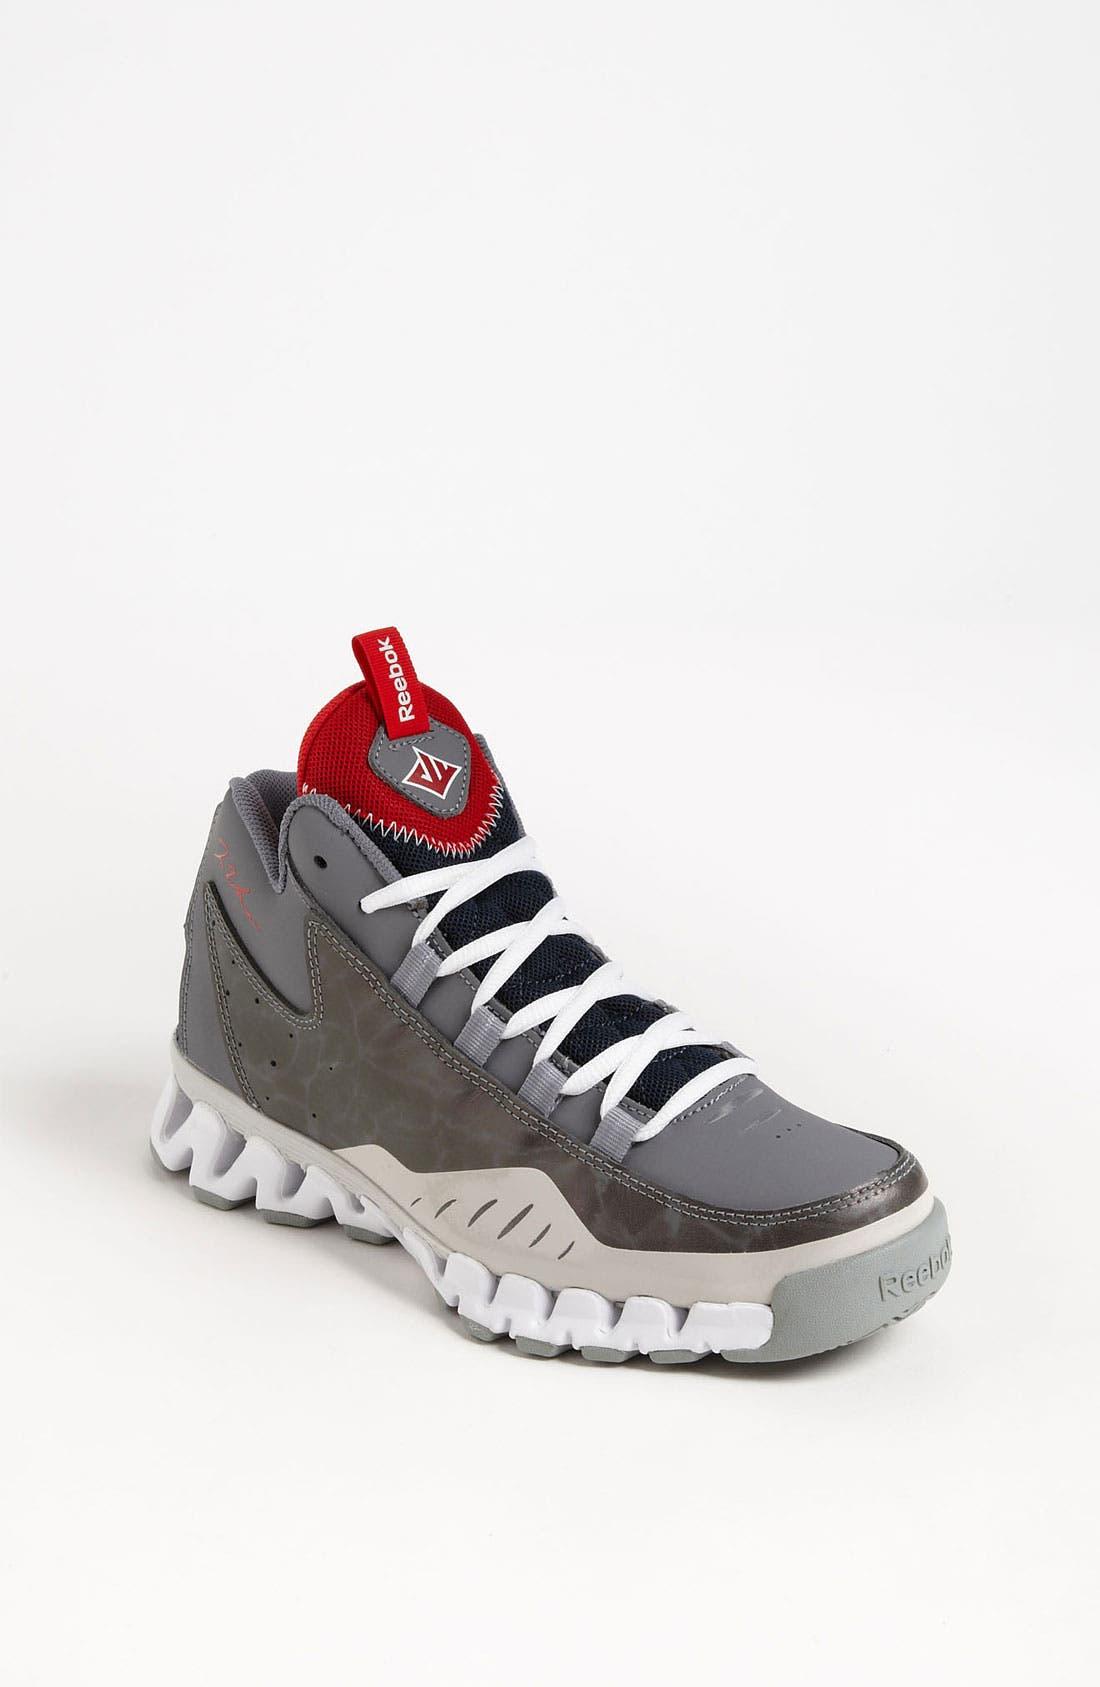 Main Image - Reebok 'Wall Season 3: ZigEscape' Basketball Shoe (Big Kids)